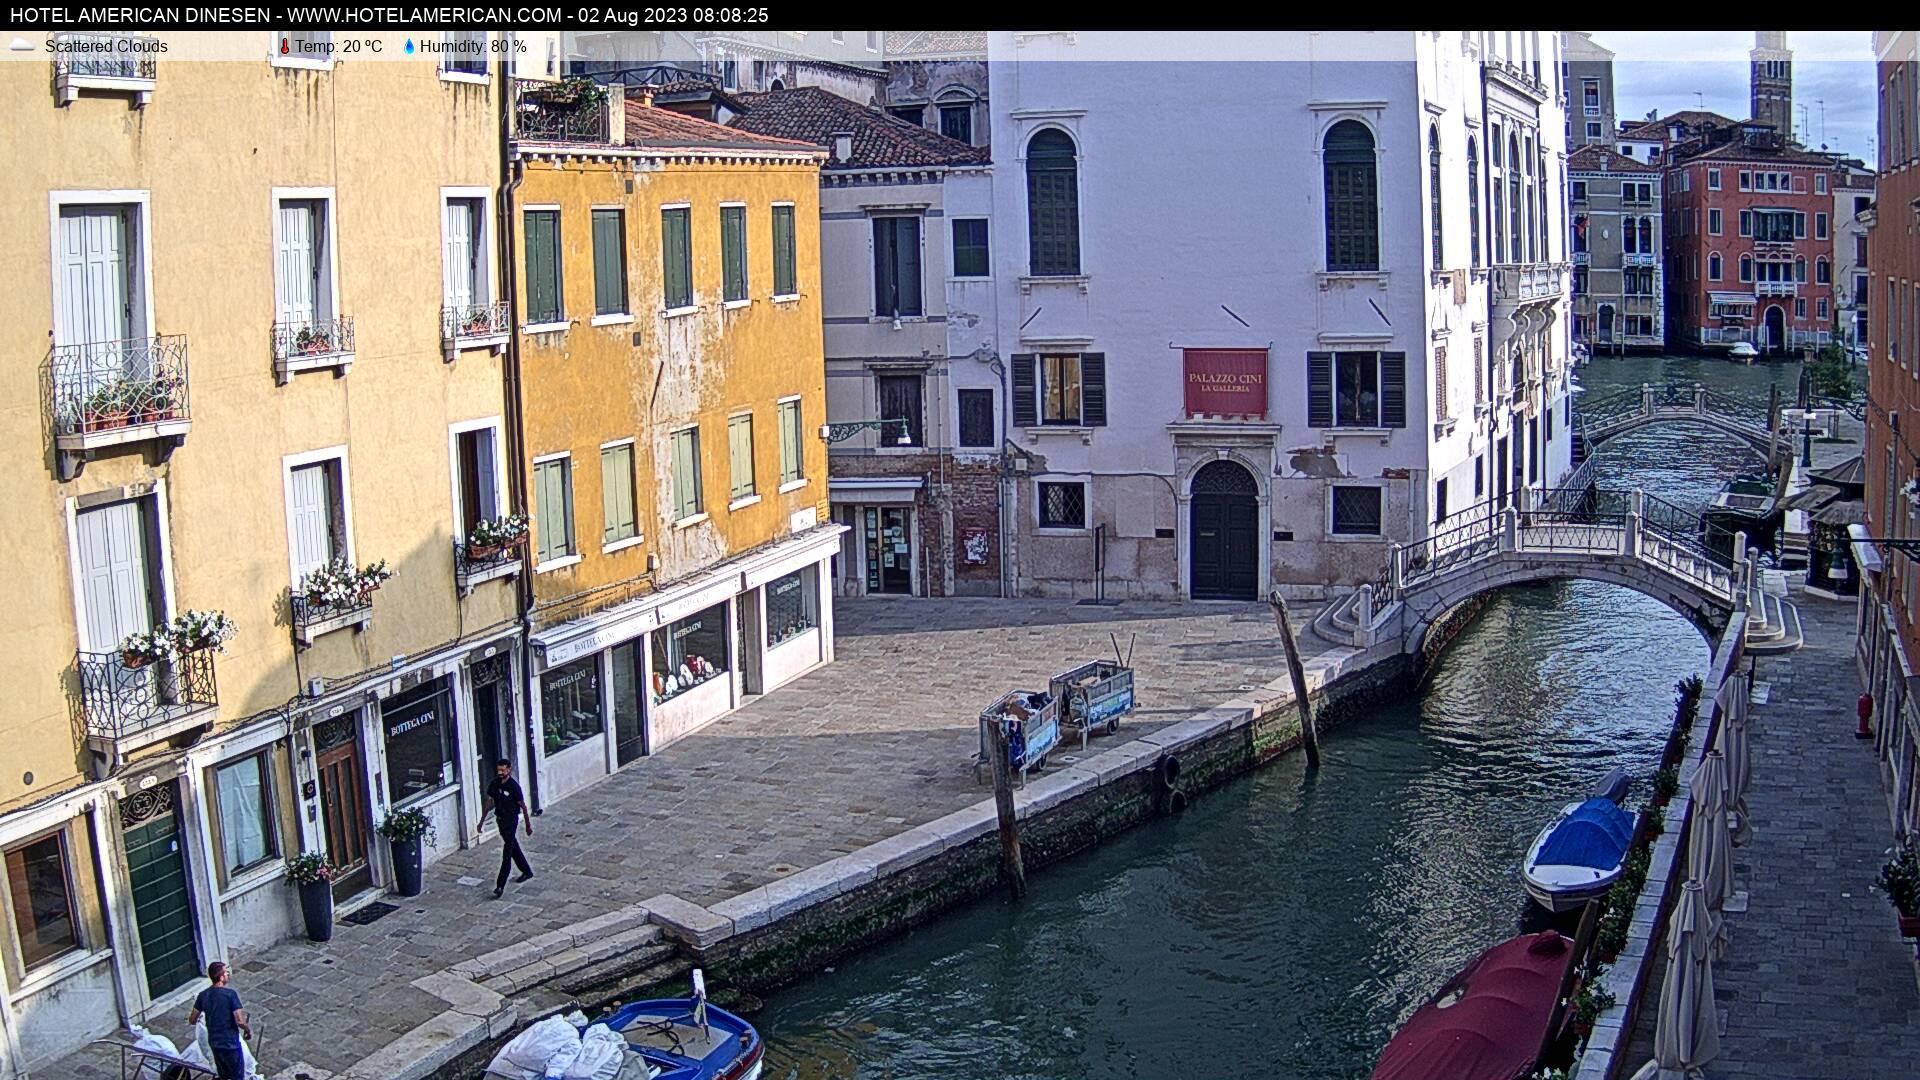 Venedig Sa. 08:08